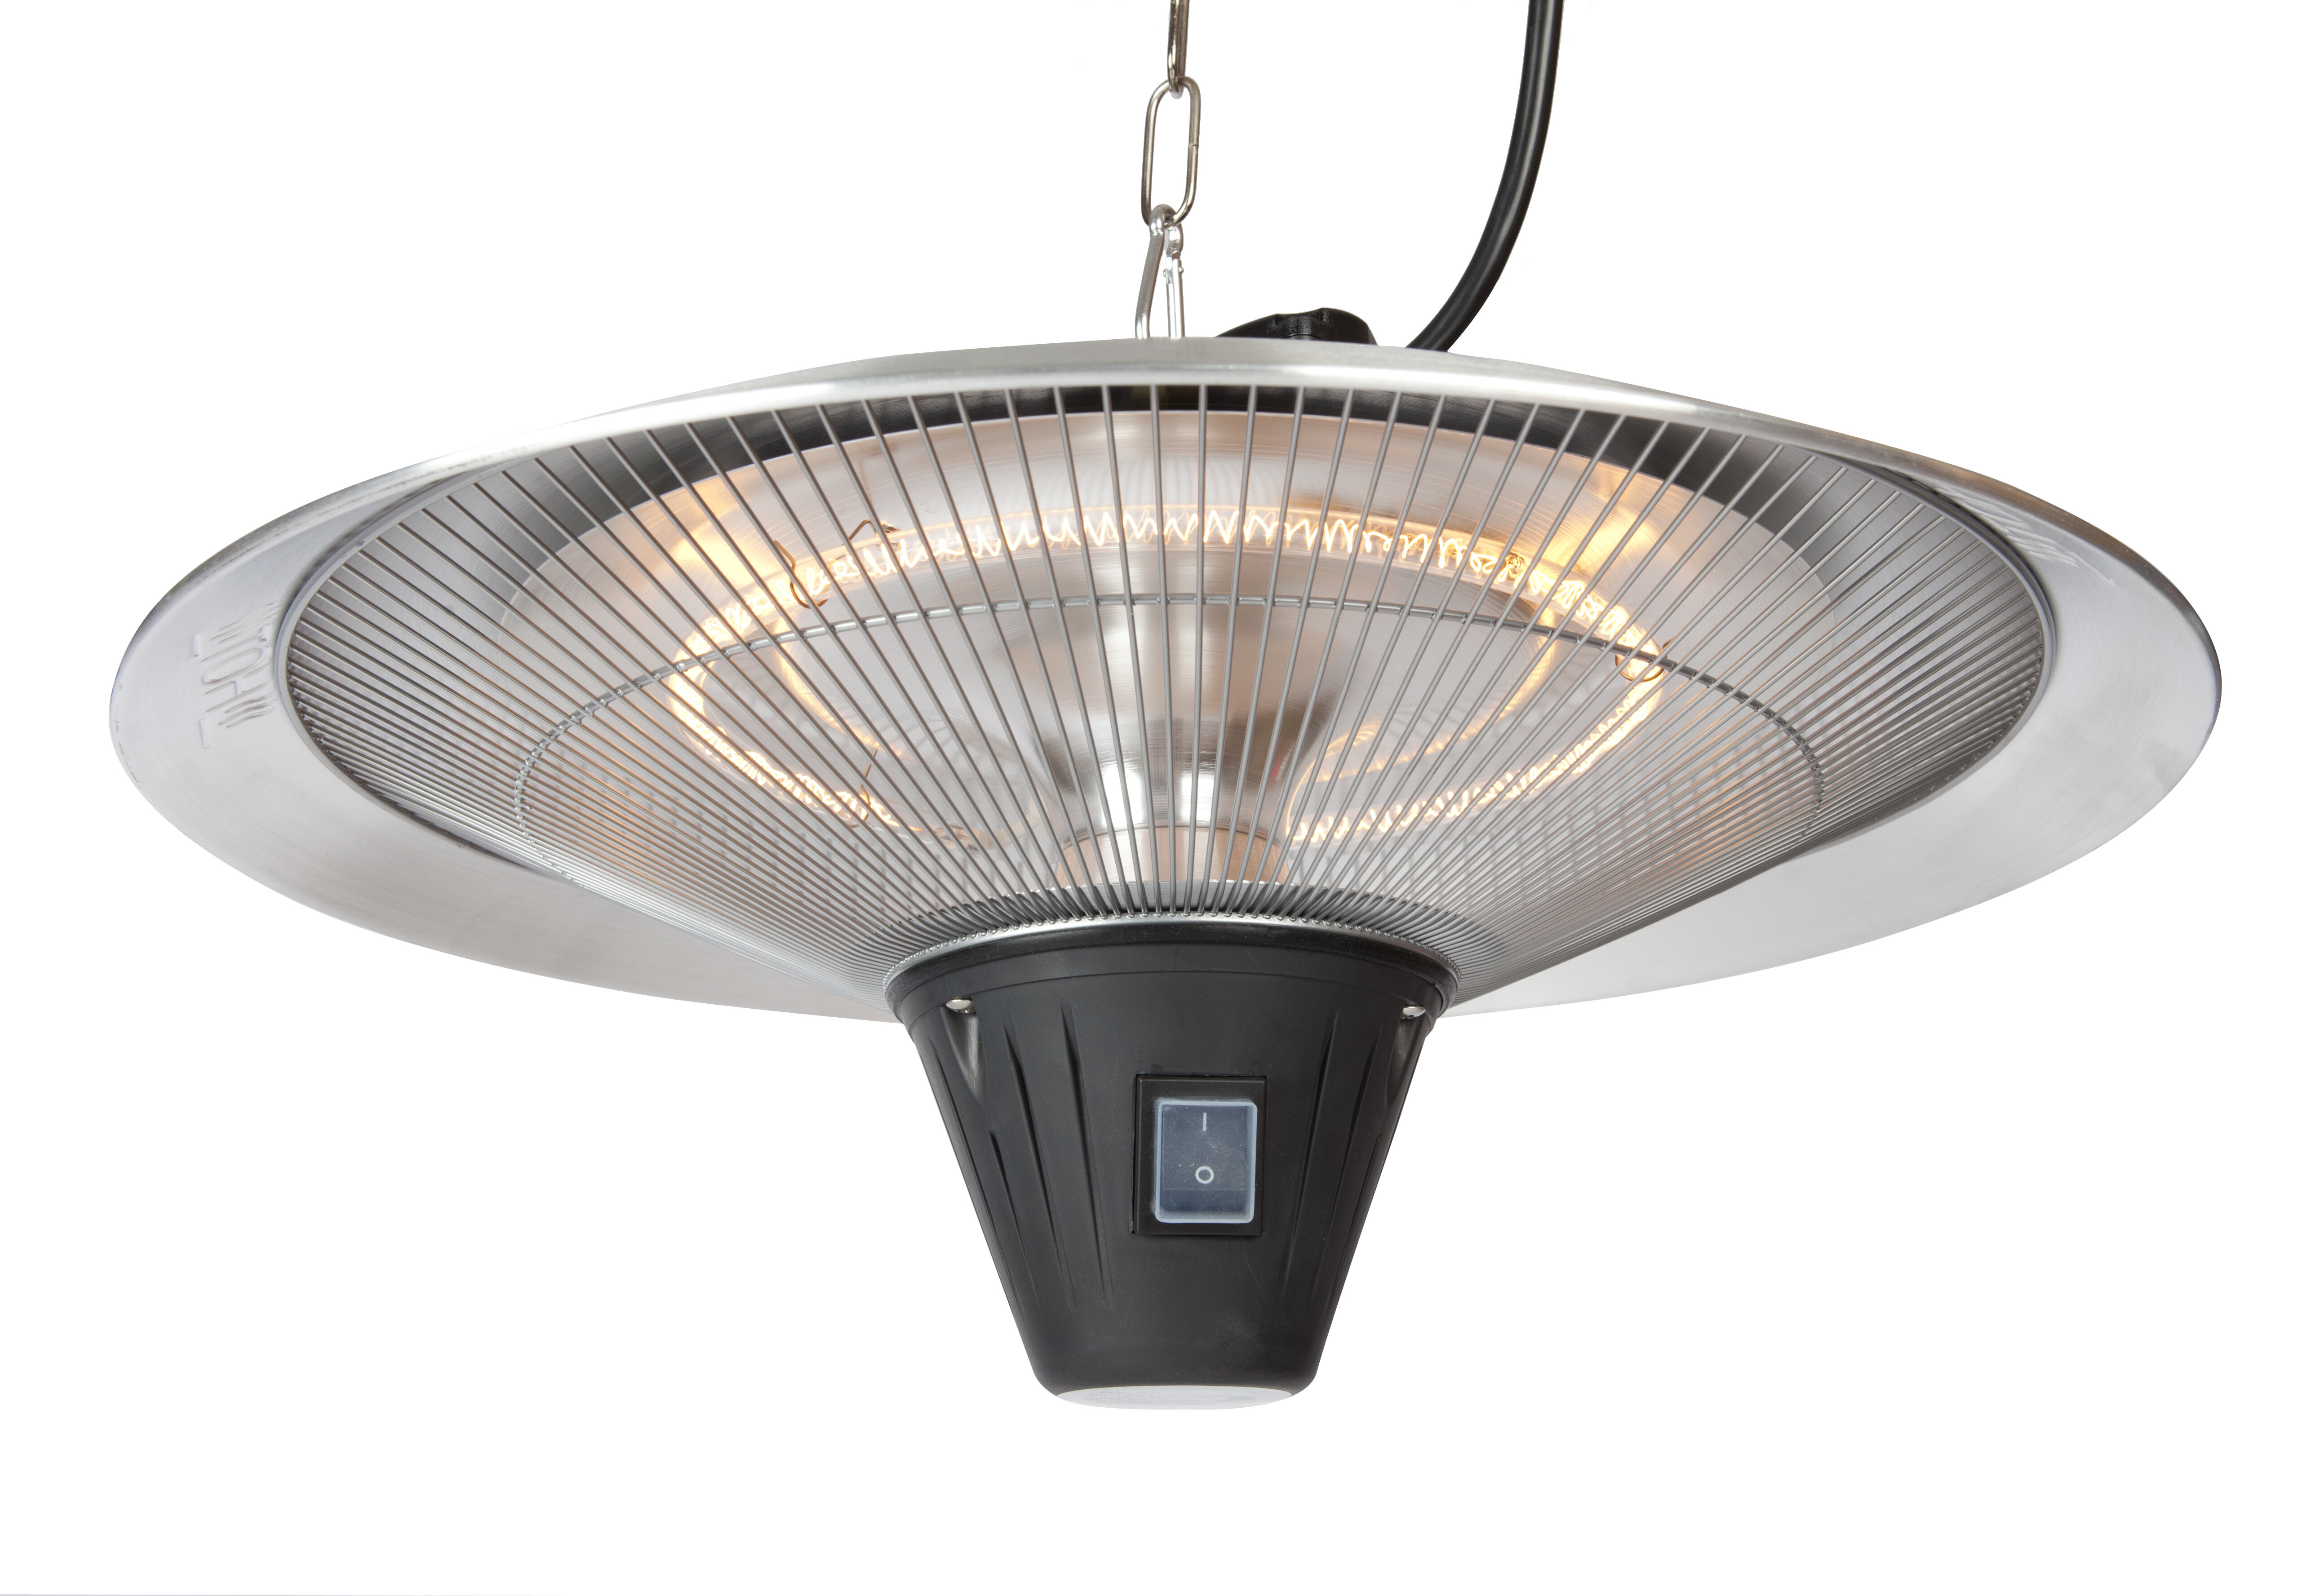 4100 Btu Electric Hanging Patio Heater